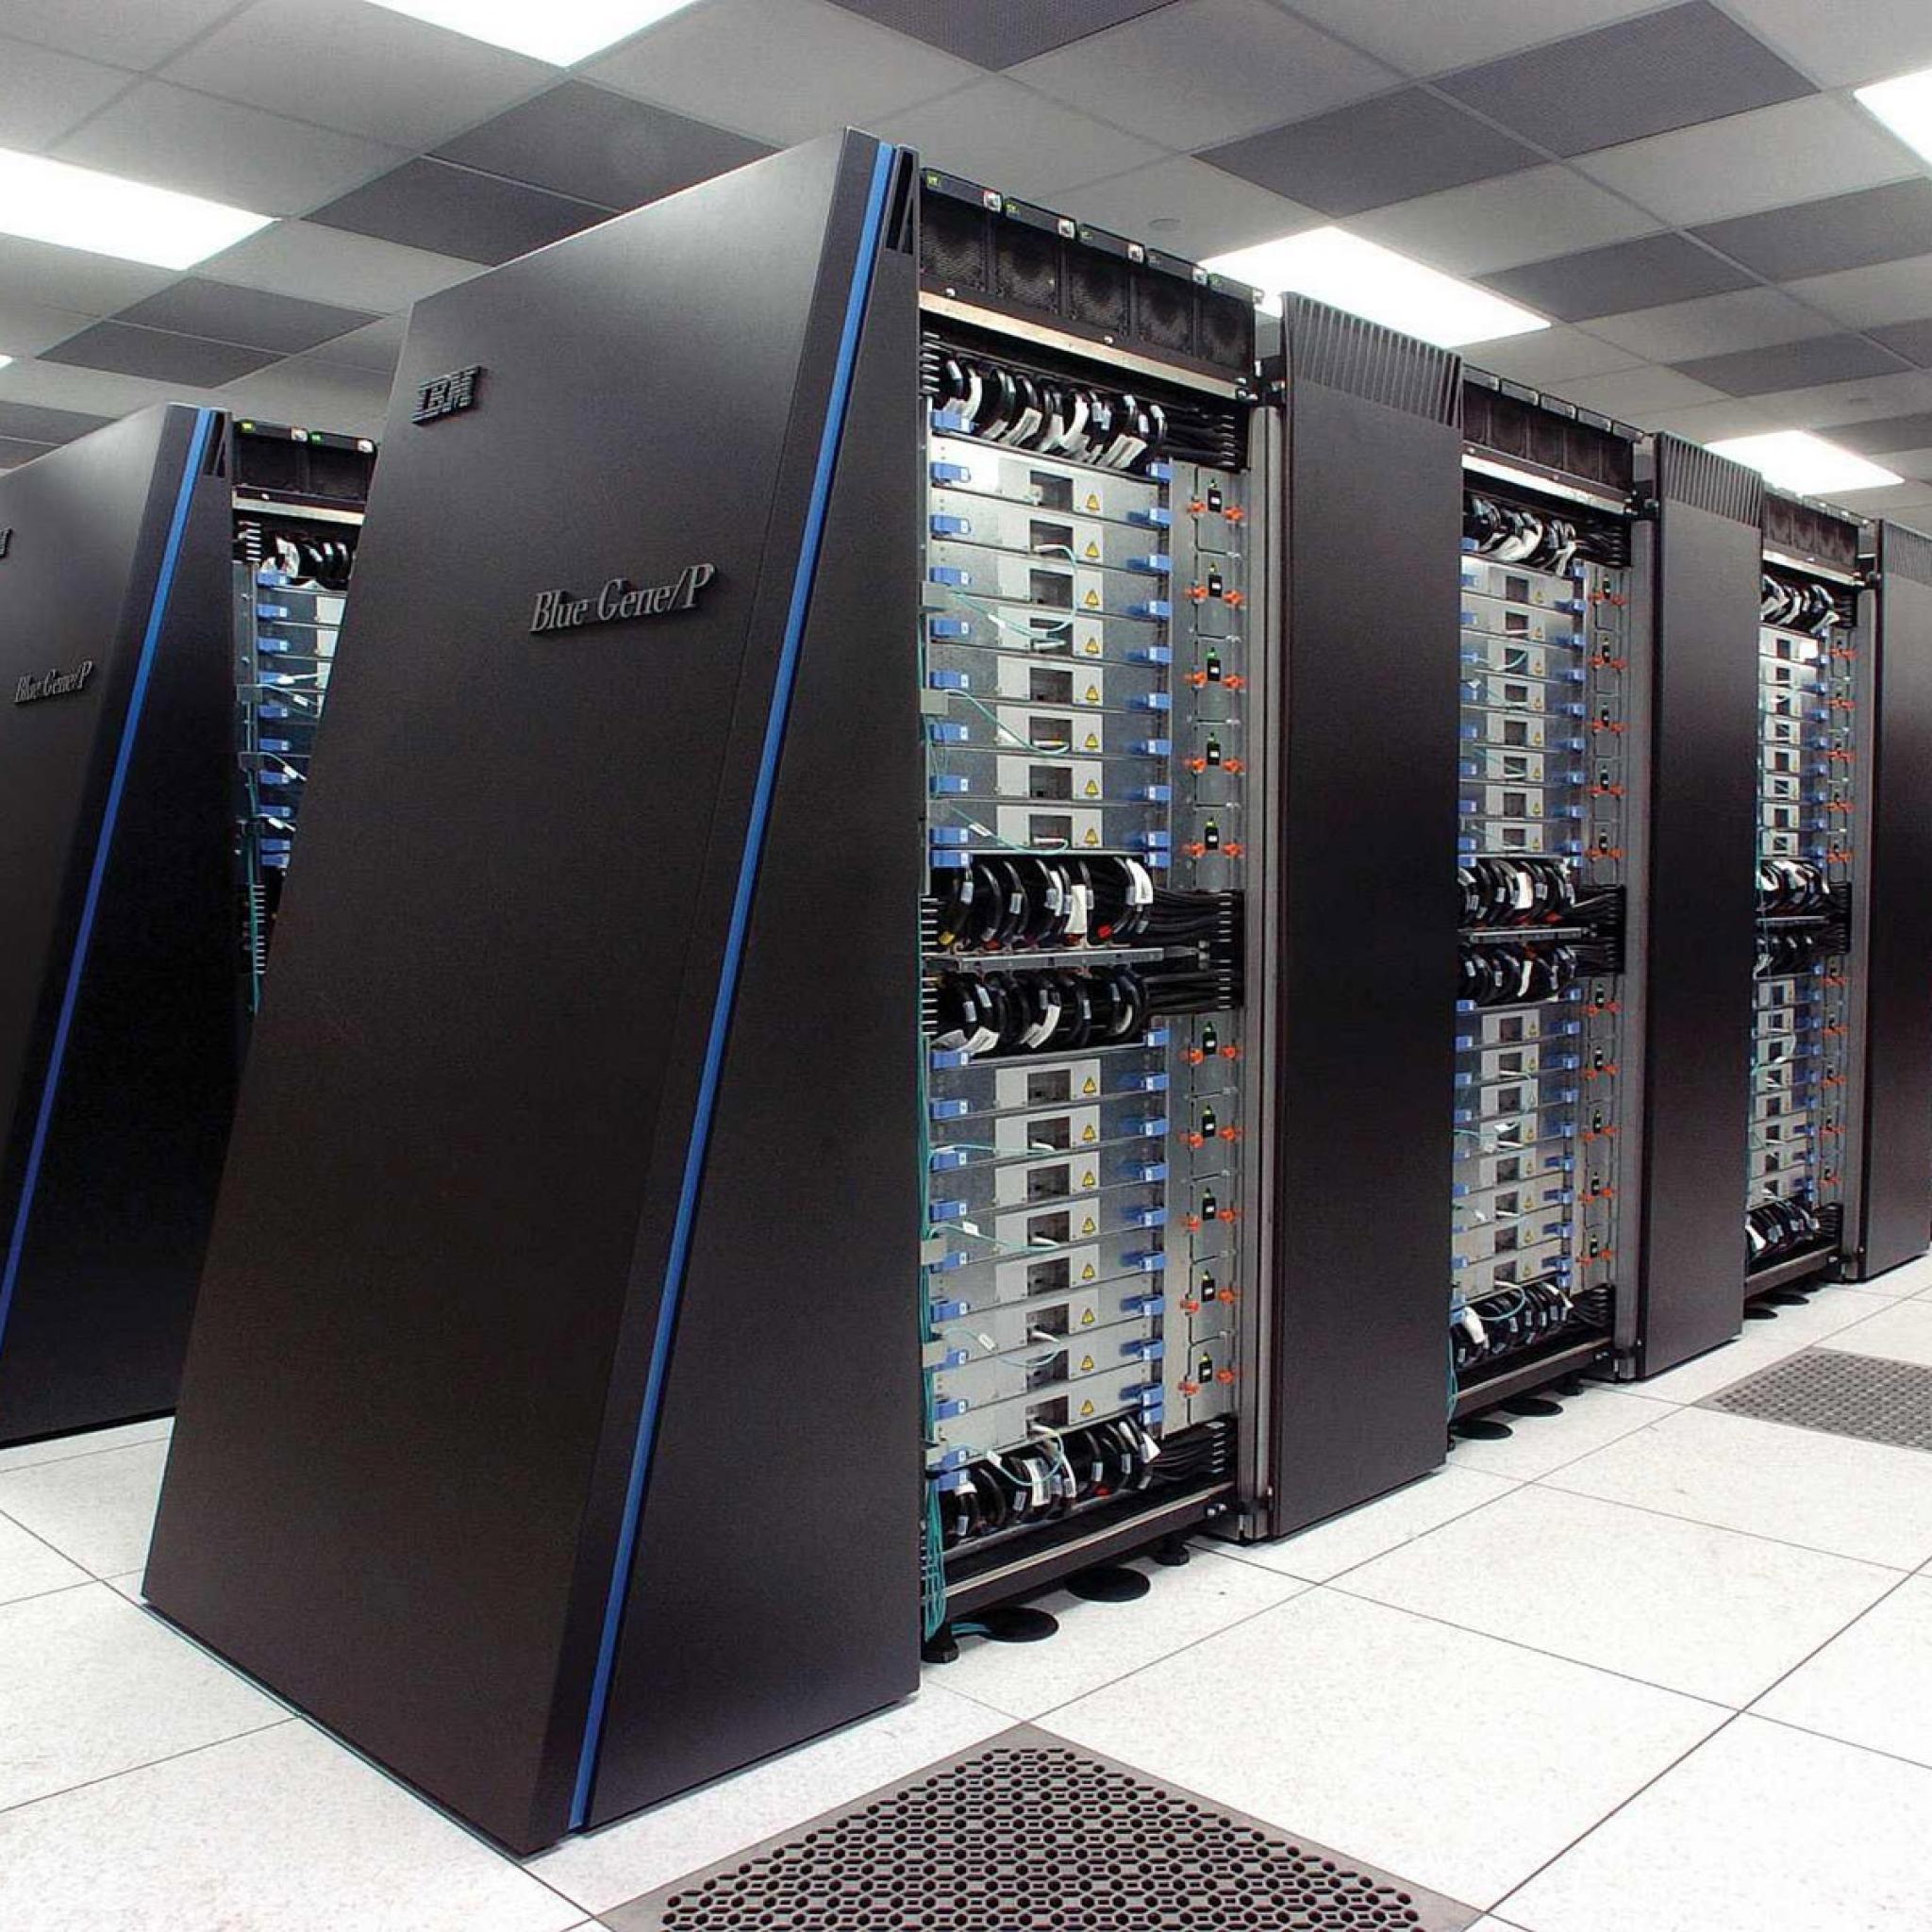 IBM-Blue-Gene-P-Supercomputer1-2048x2048.jpg